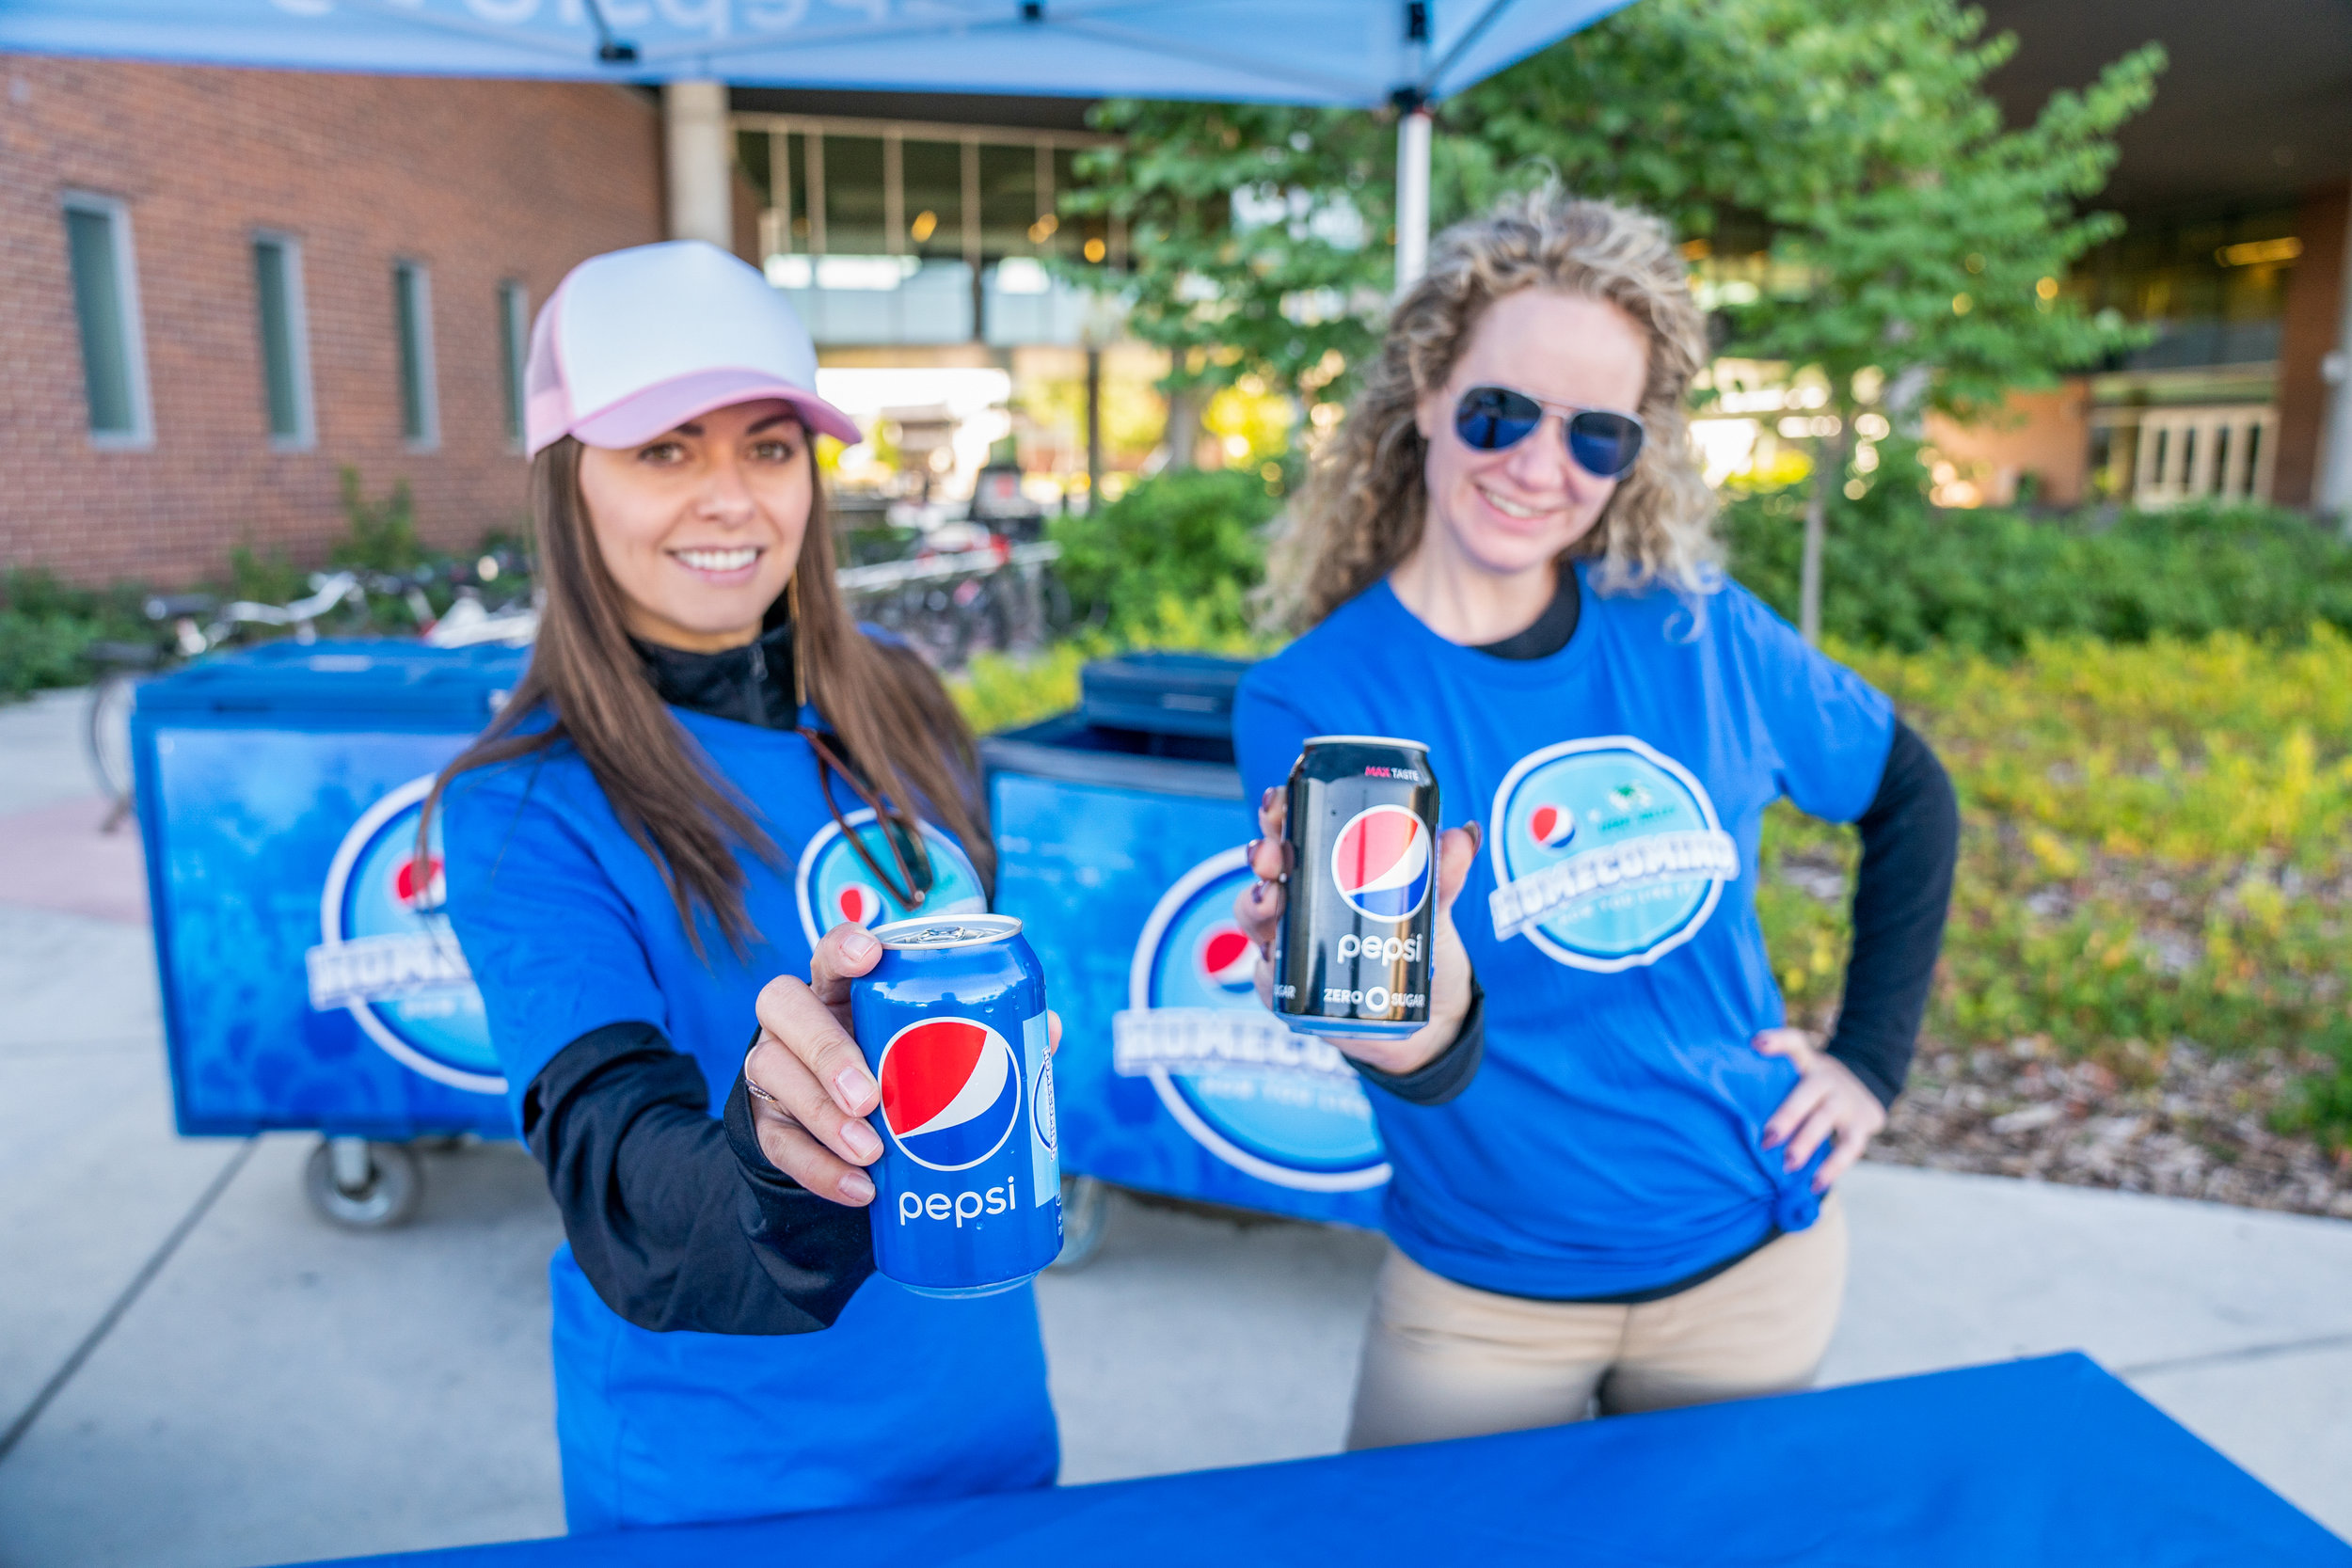 OHelloMedia-Pepsi-UVUHomecoming-9.26-0006.jpg